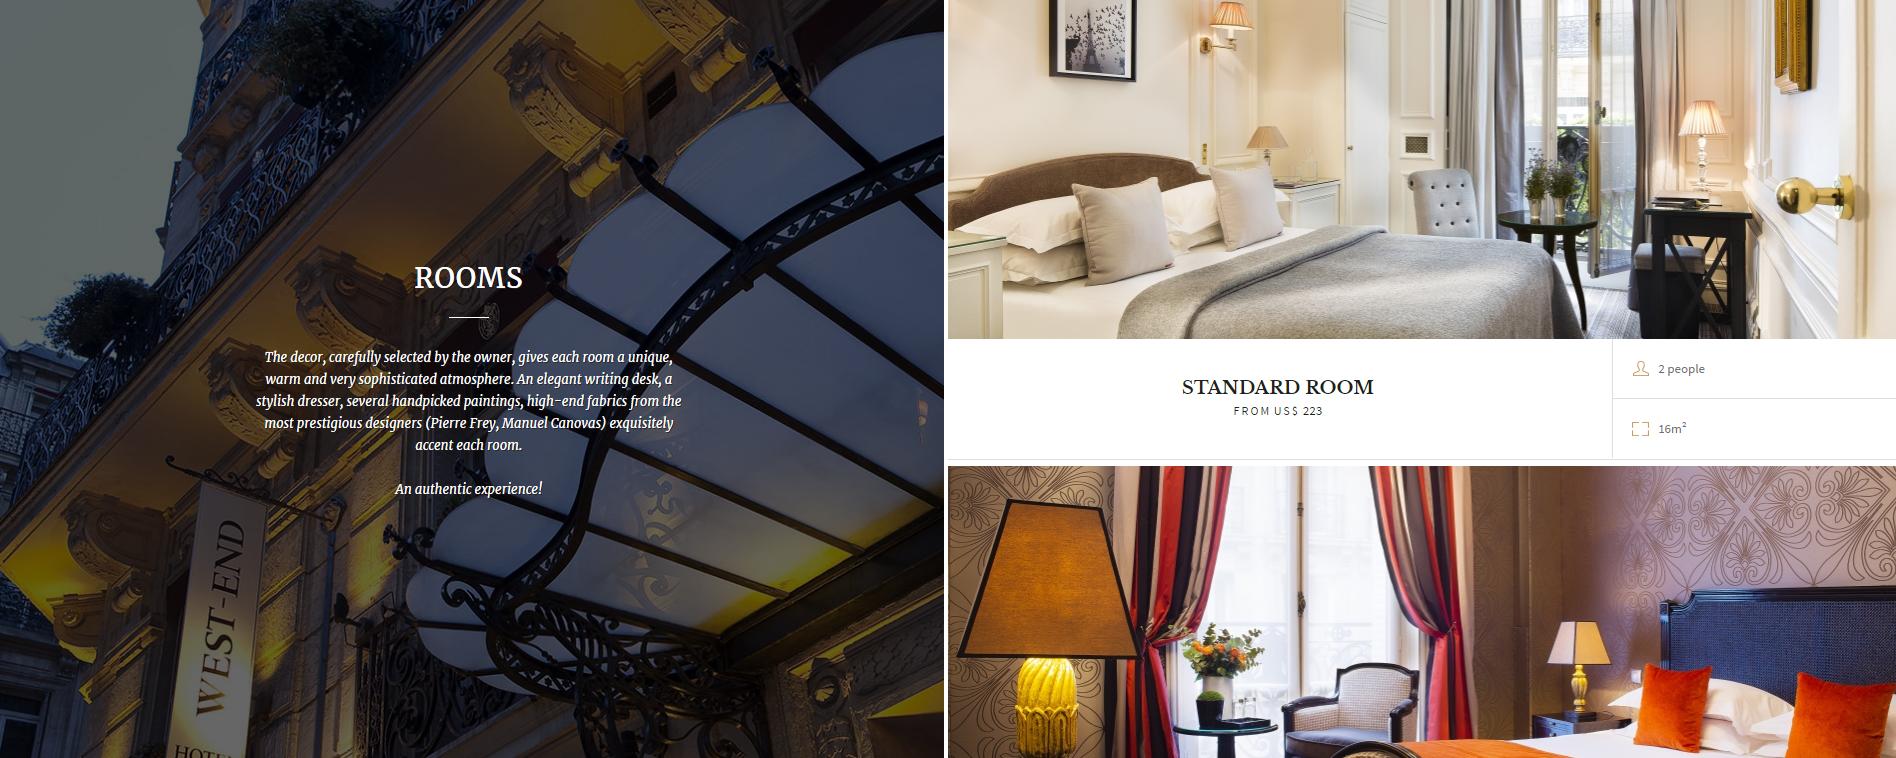 Hotel West End website room gallery